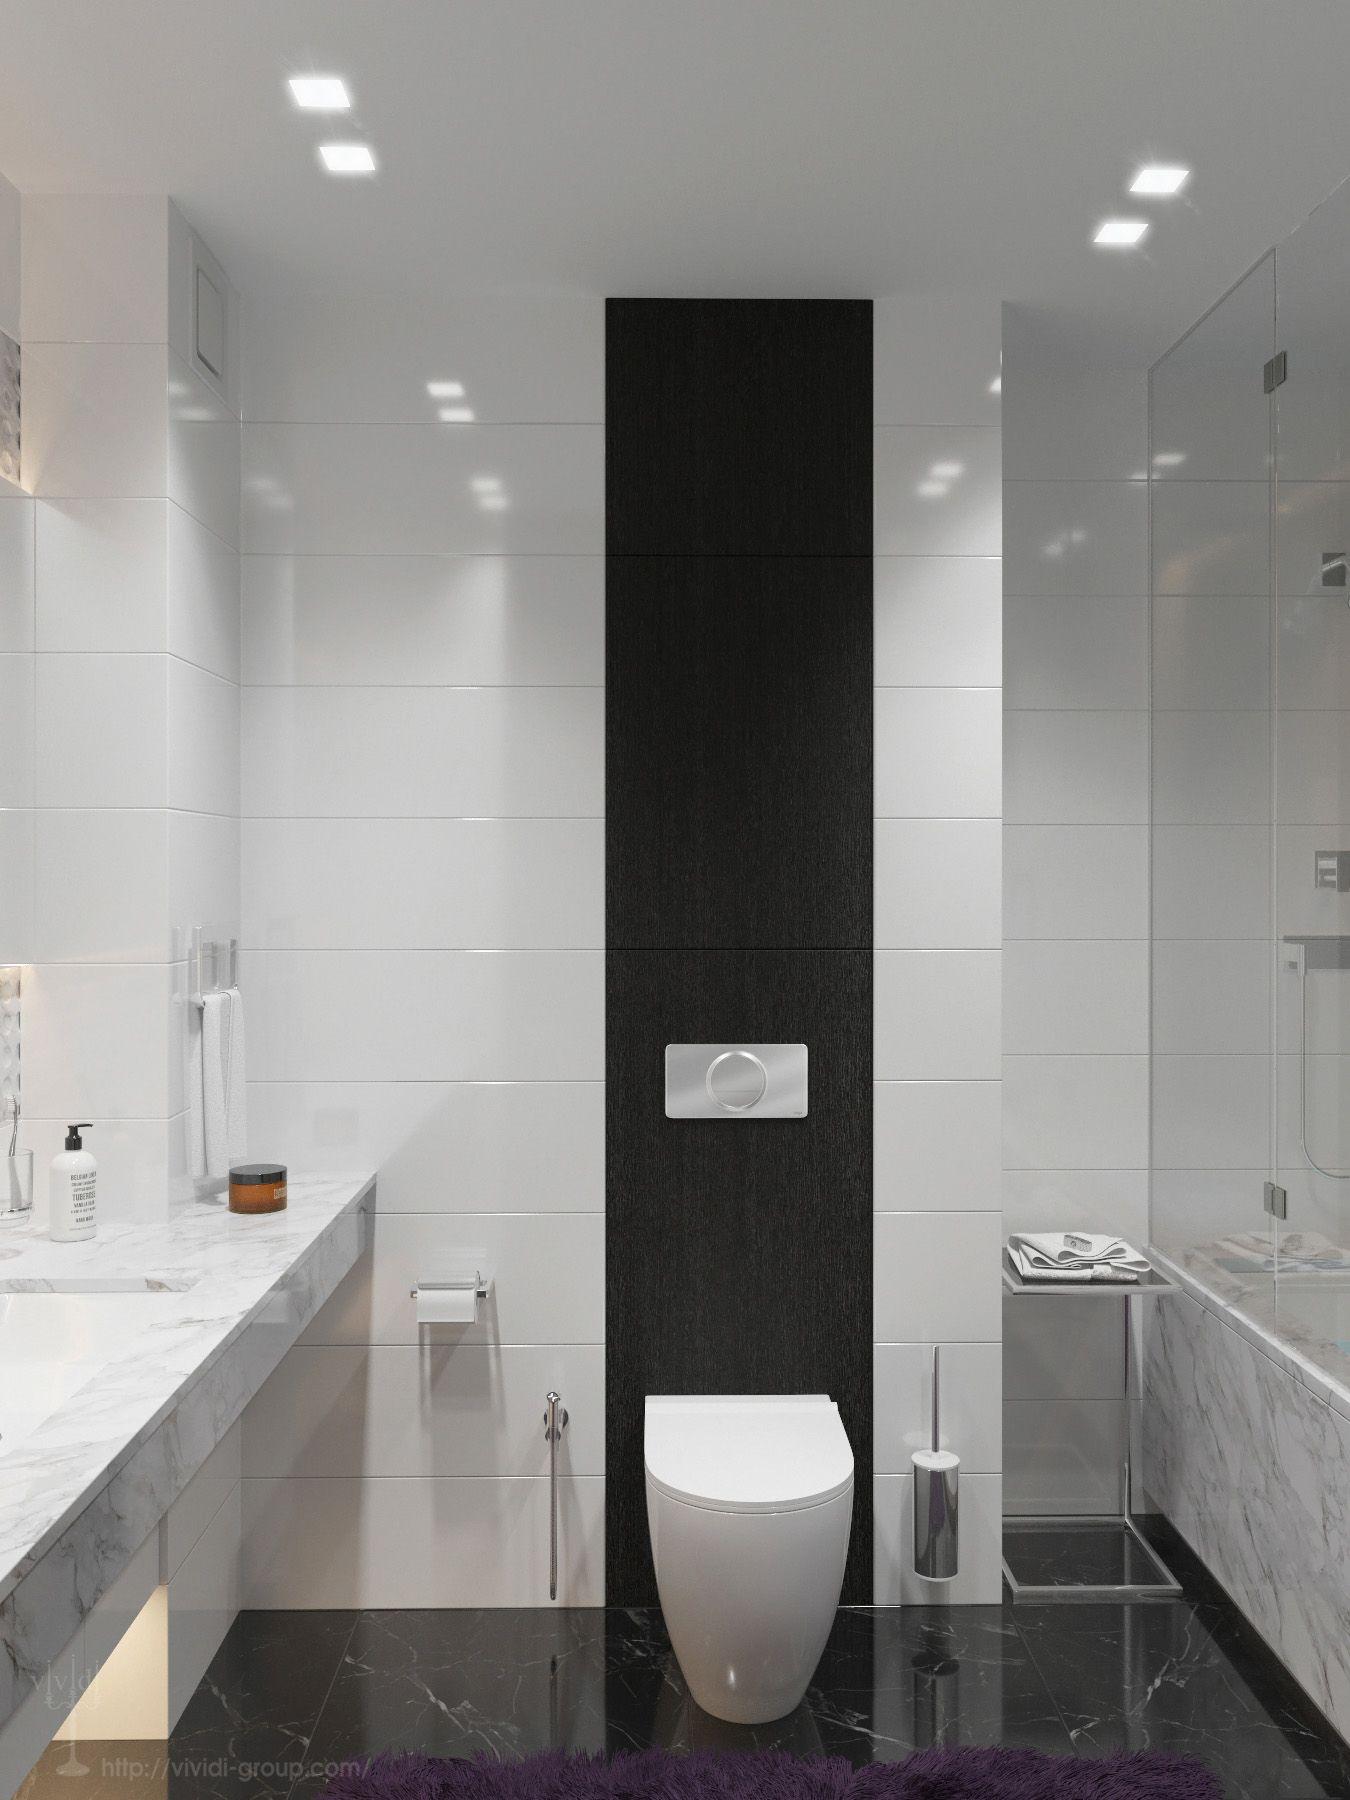 Modern bathroom toilet - Modern Bathroom Rendering Software 3ds Max Ps